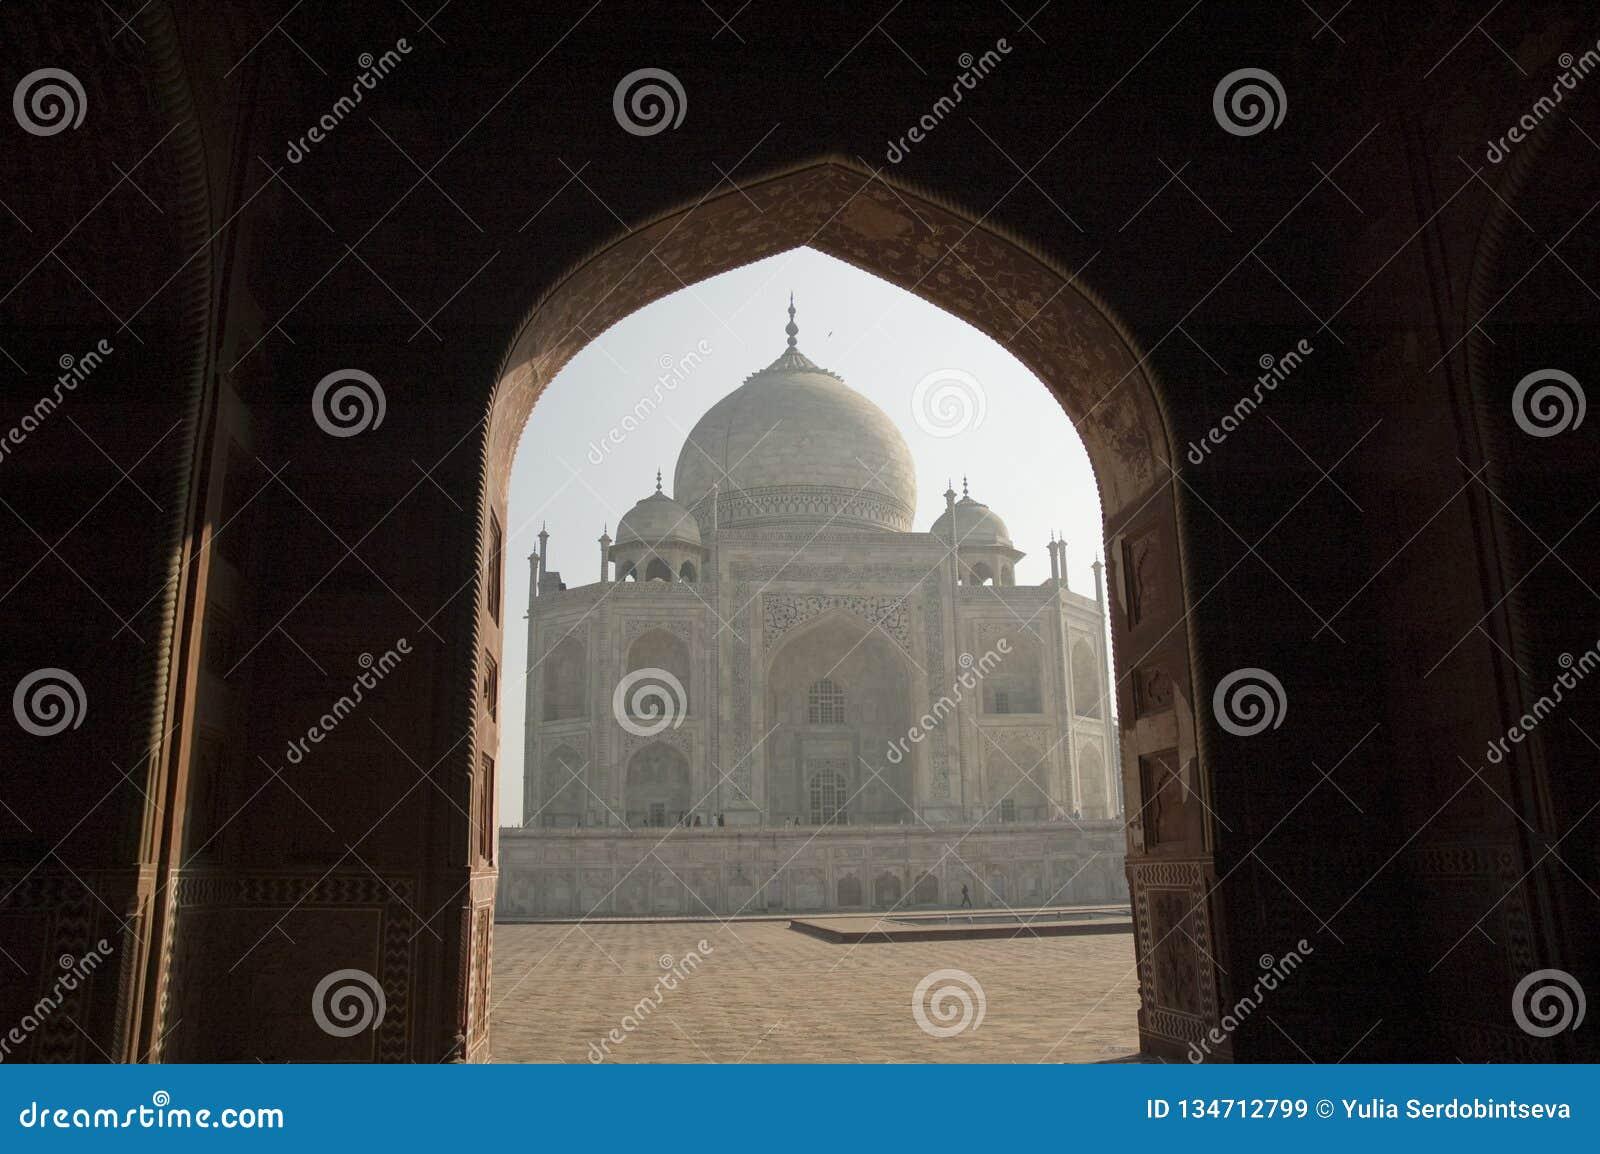 Silhouette de Taj Mahal par une arcade agra l Inde